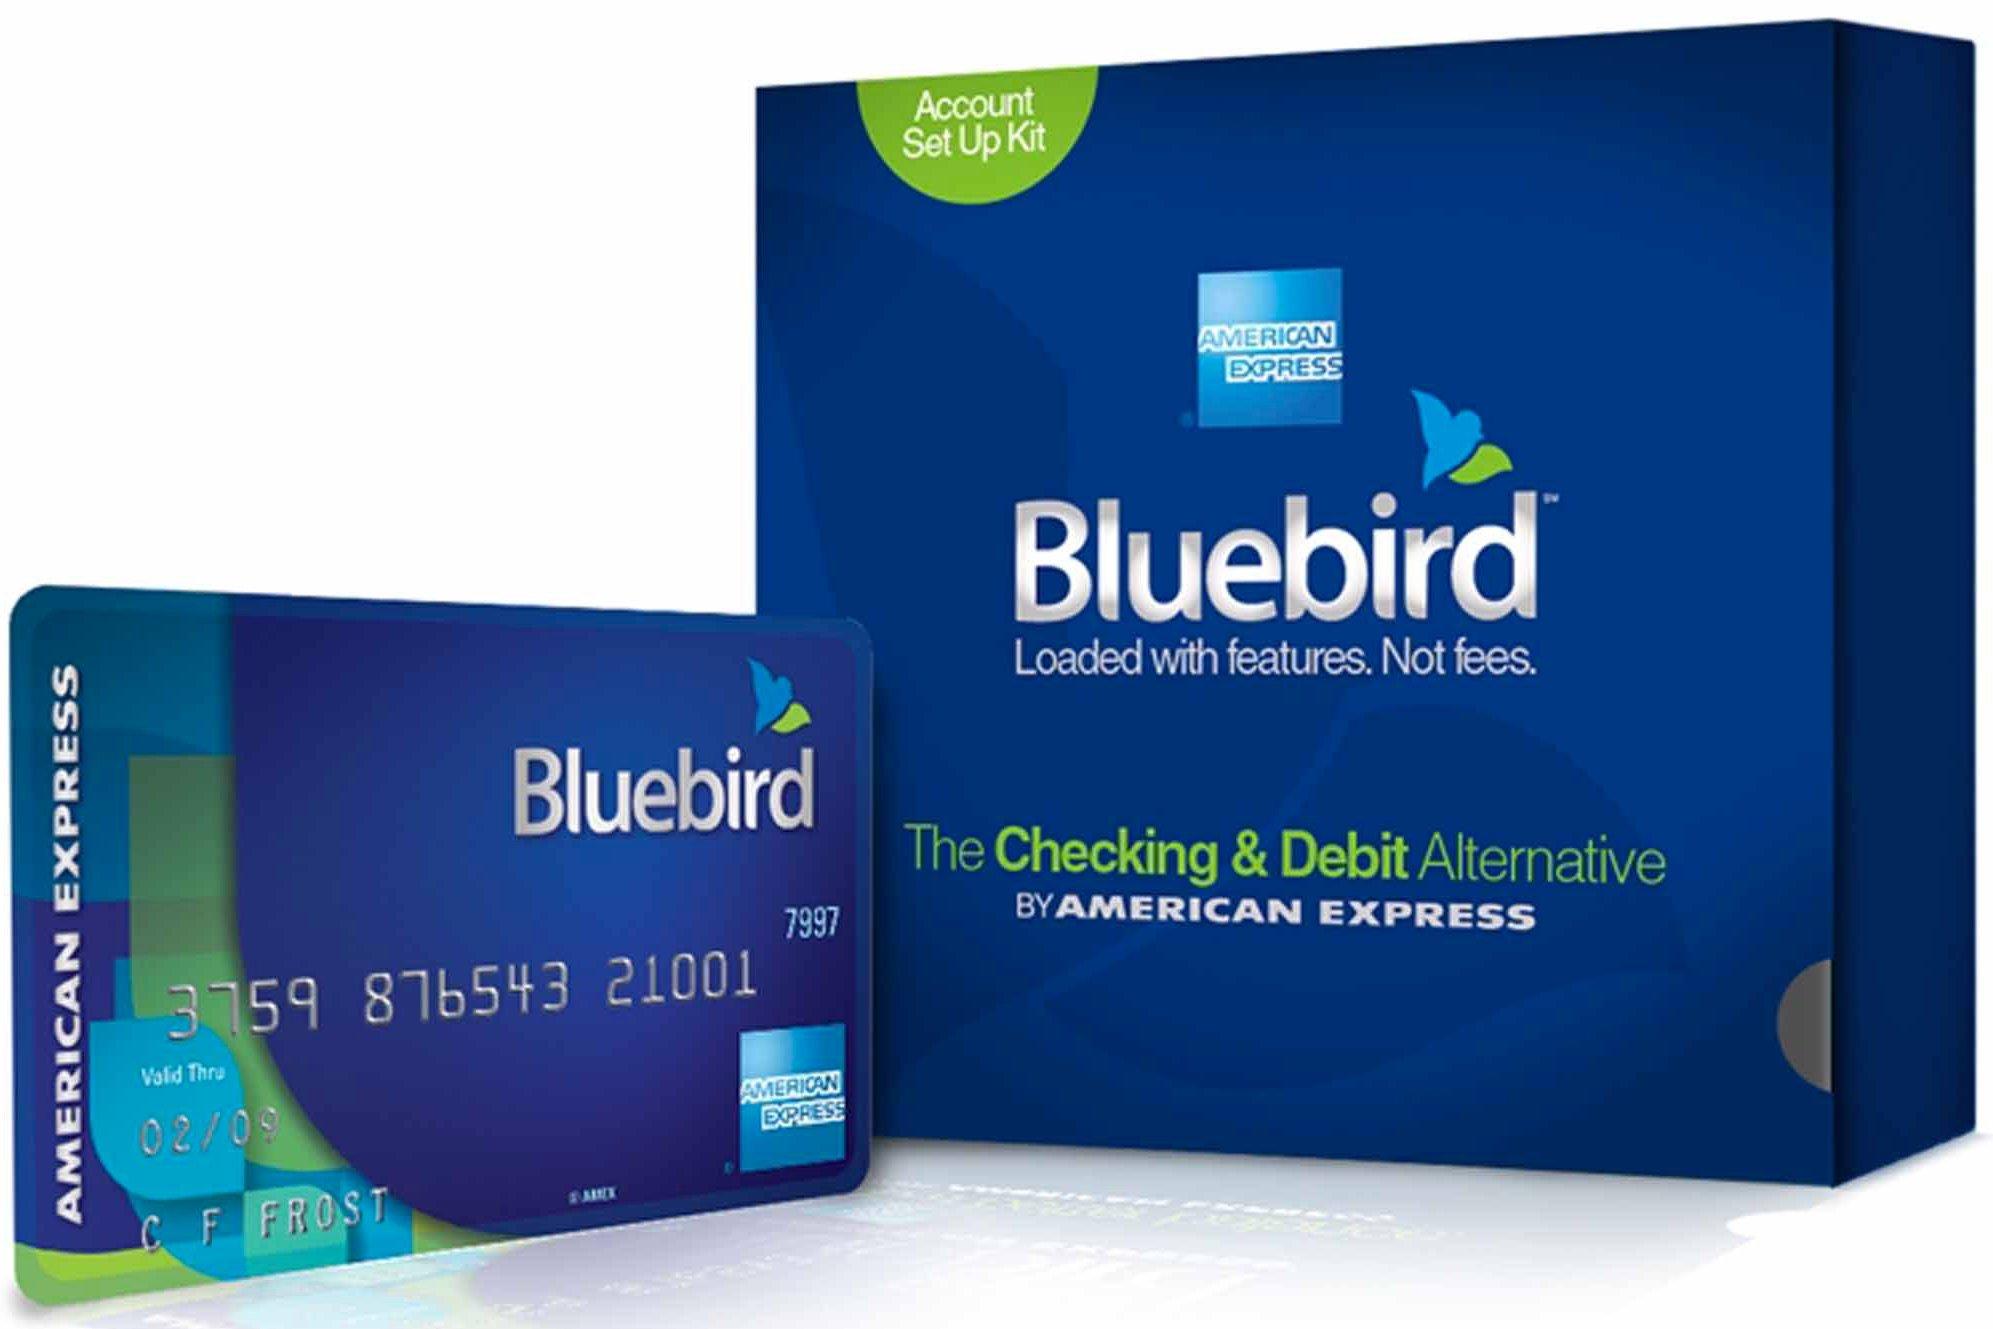 Where to Buy a Bluebird card - American Express Bluebird